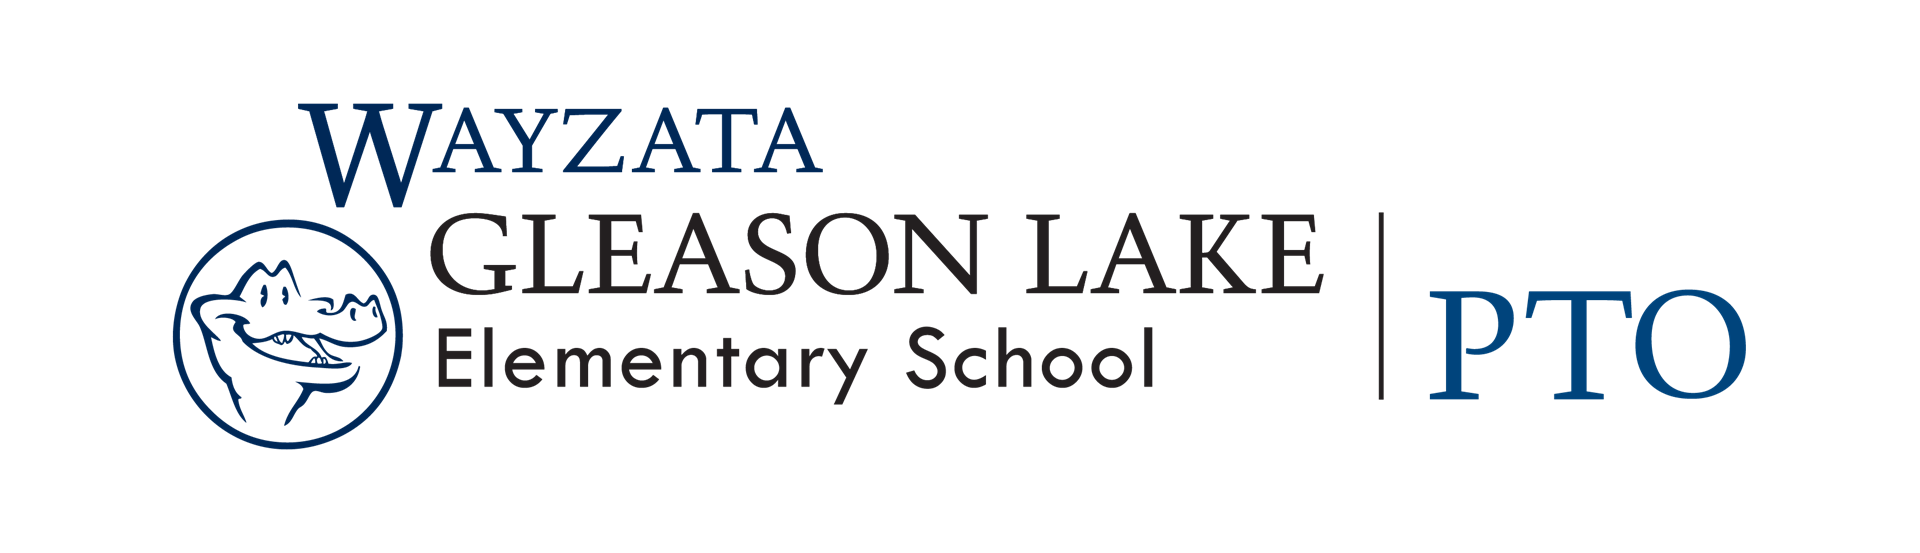 Gleason Lake PTO Logo